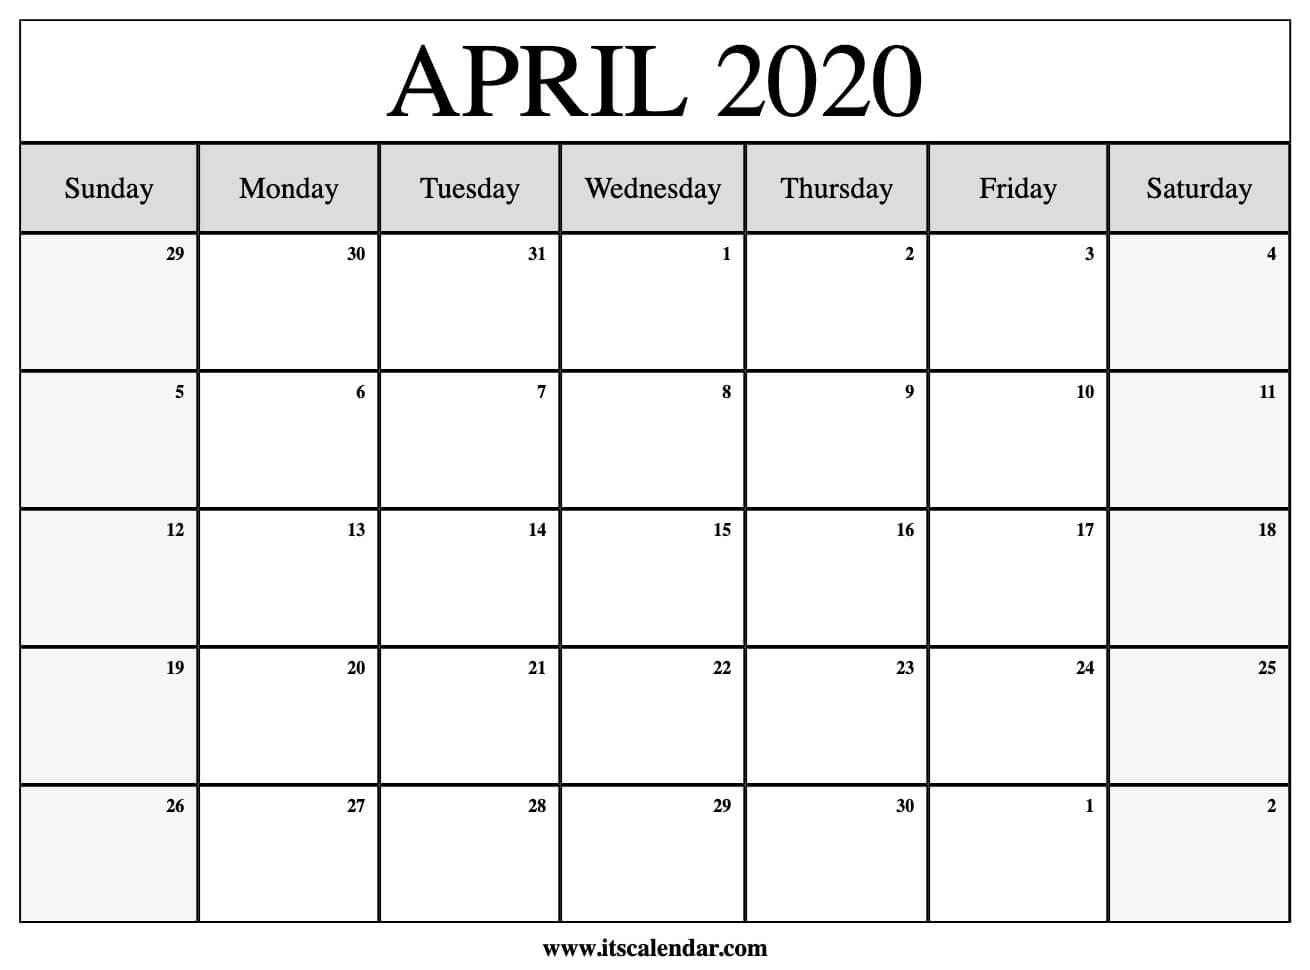 free april 2020 calendar template - Jasonkellyphoto co